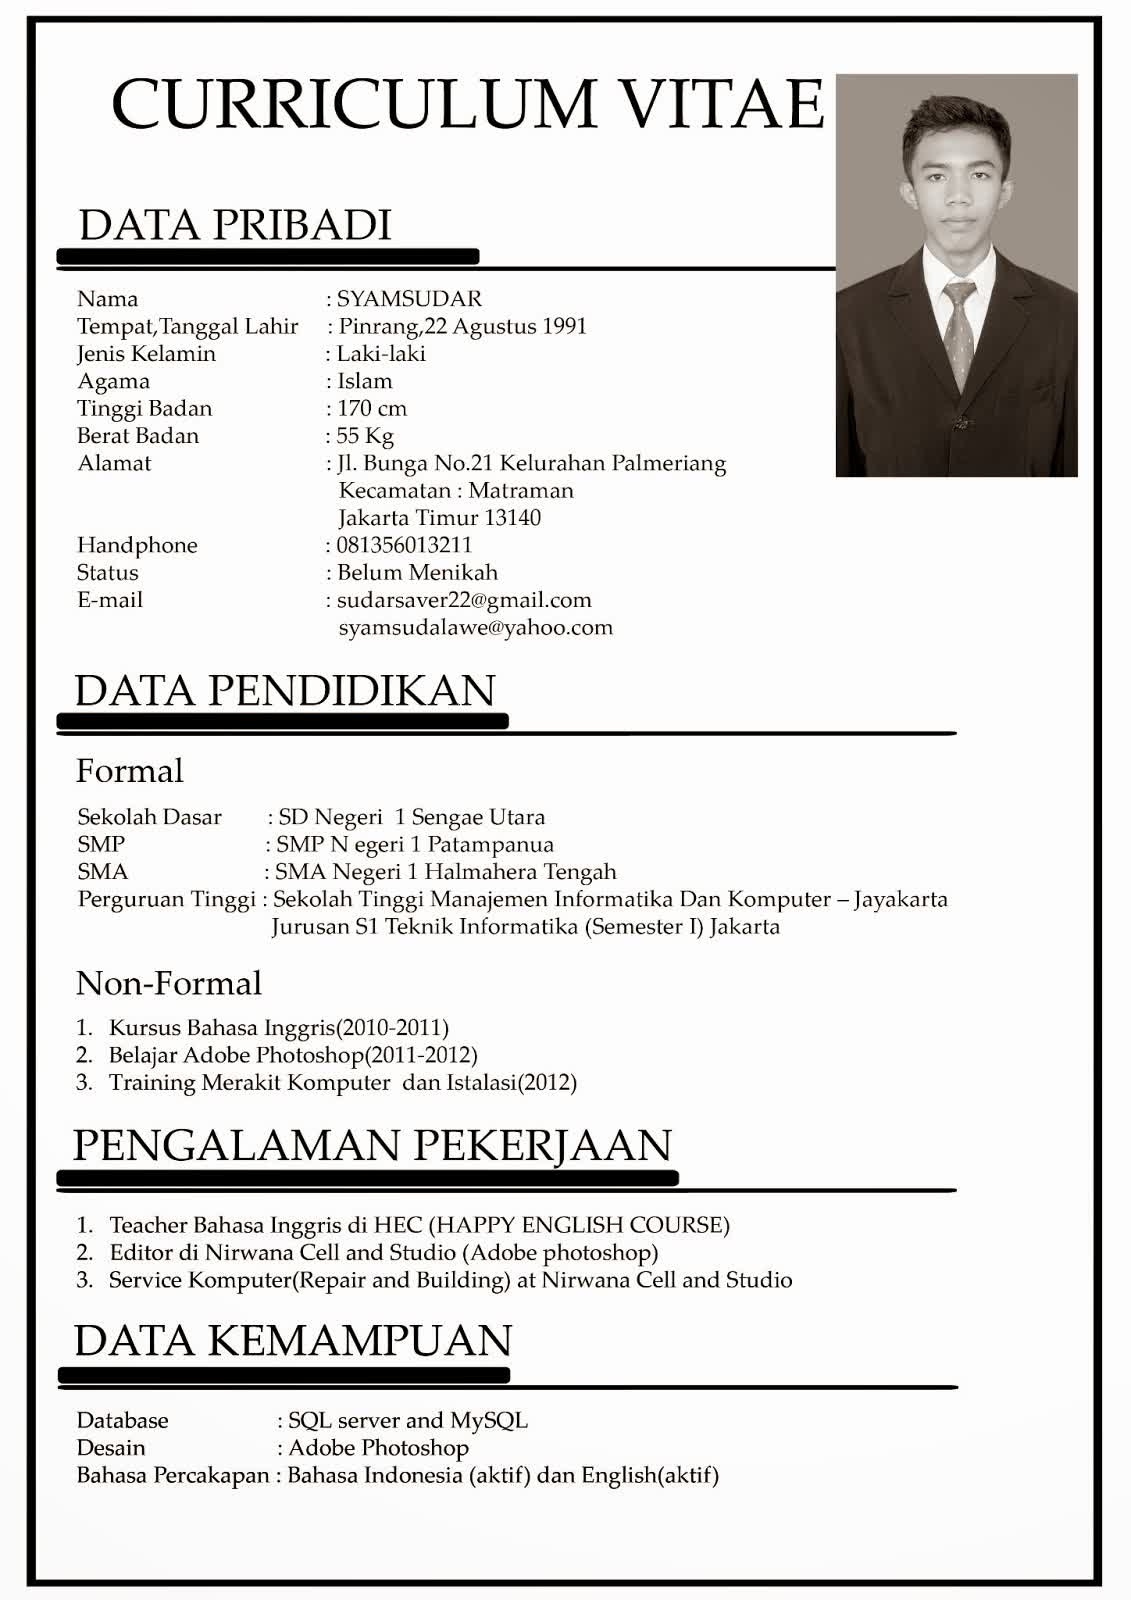 contoh singkat curriculum vitae bahasa indonesia